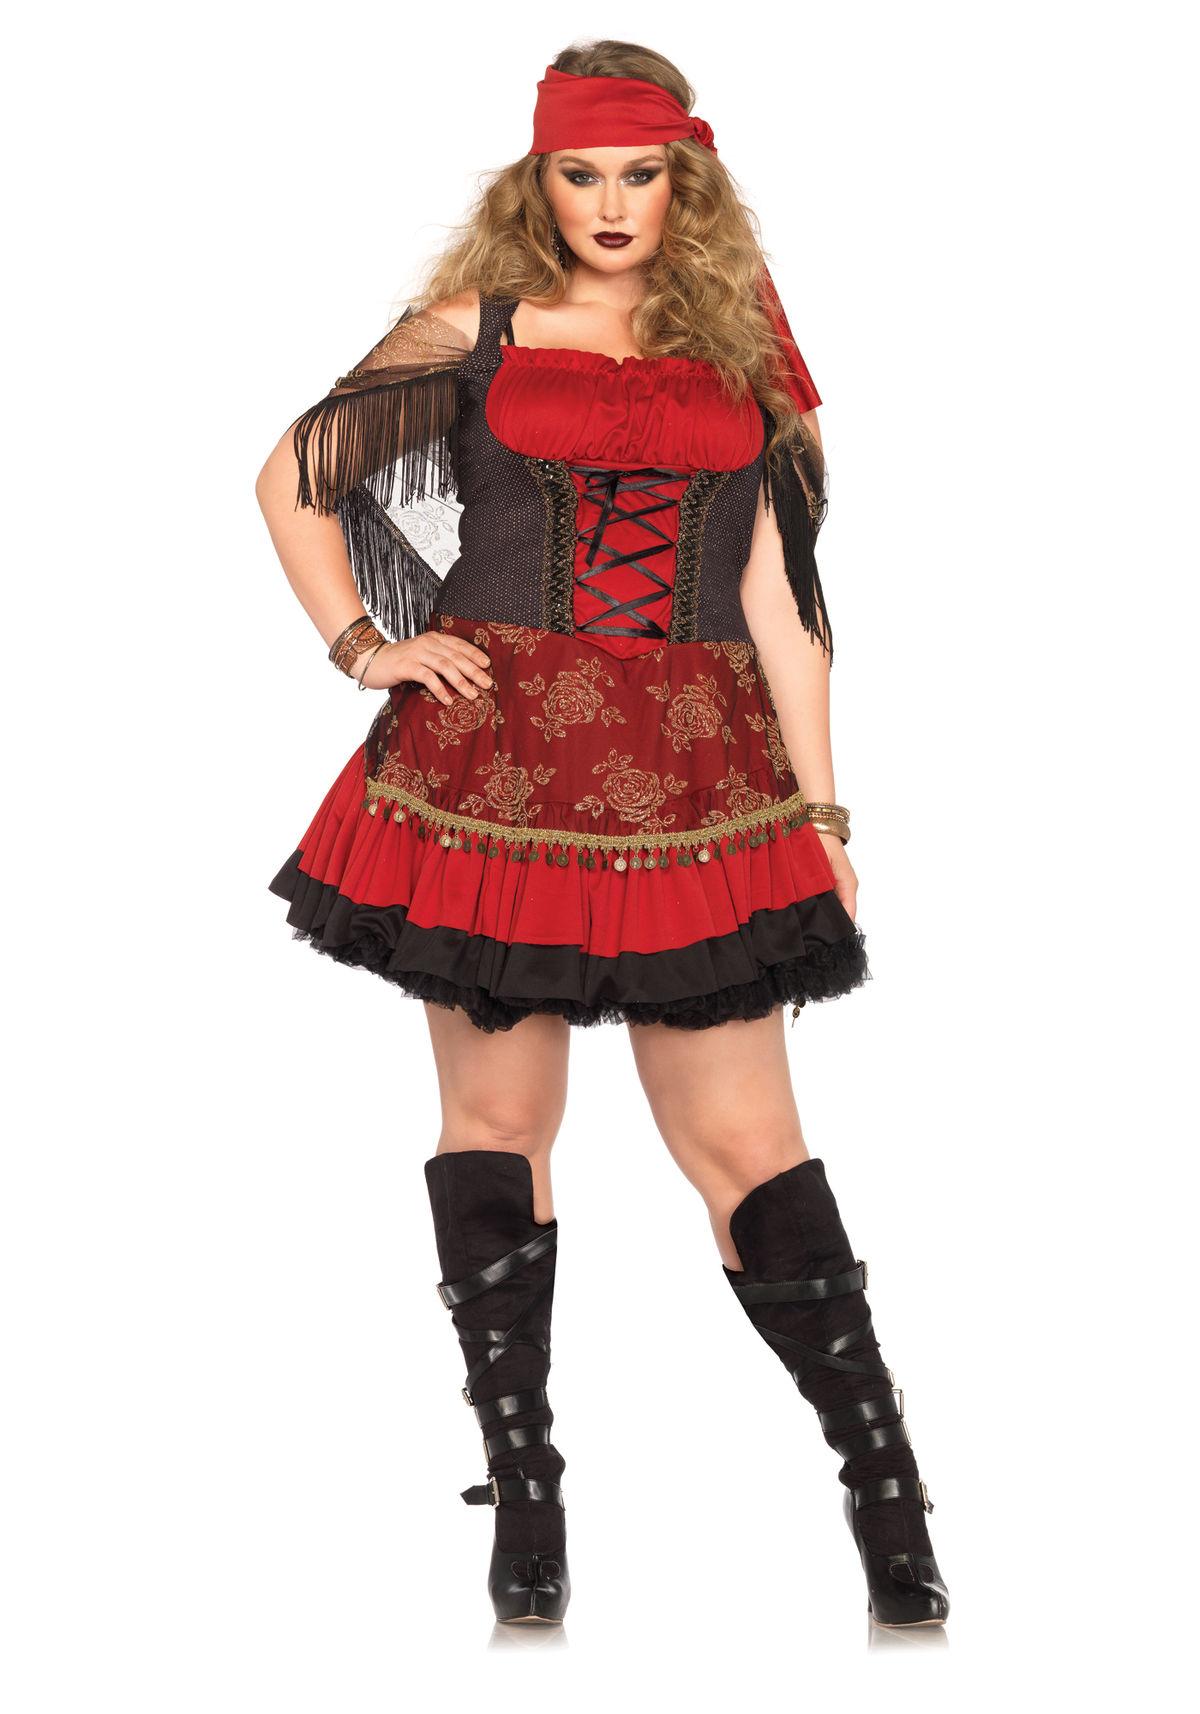 Mystic vixen costume not agree